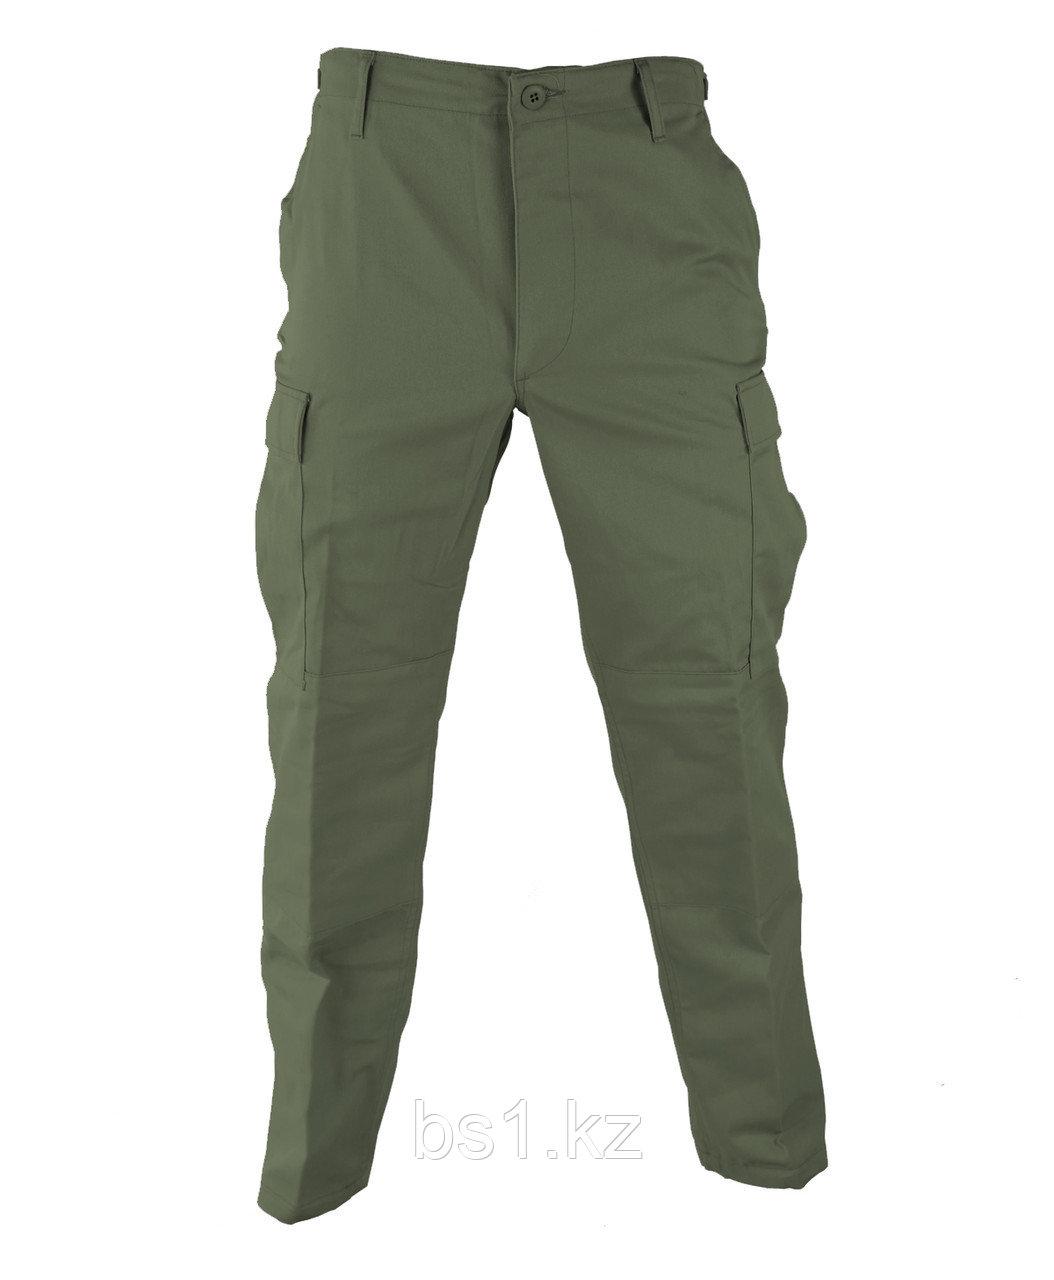 Брюки BDU Genuine Gear Pants олива Olive, Propper